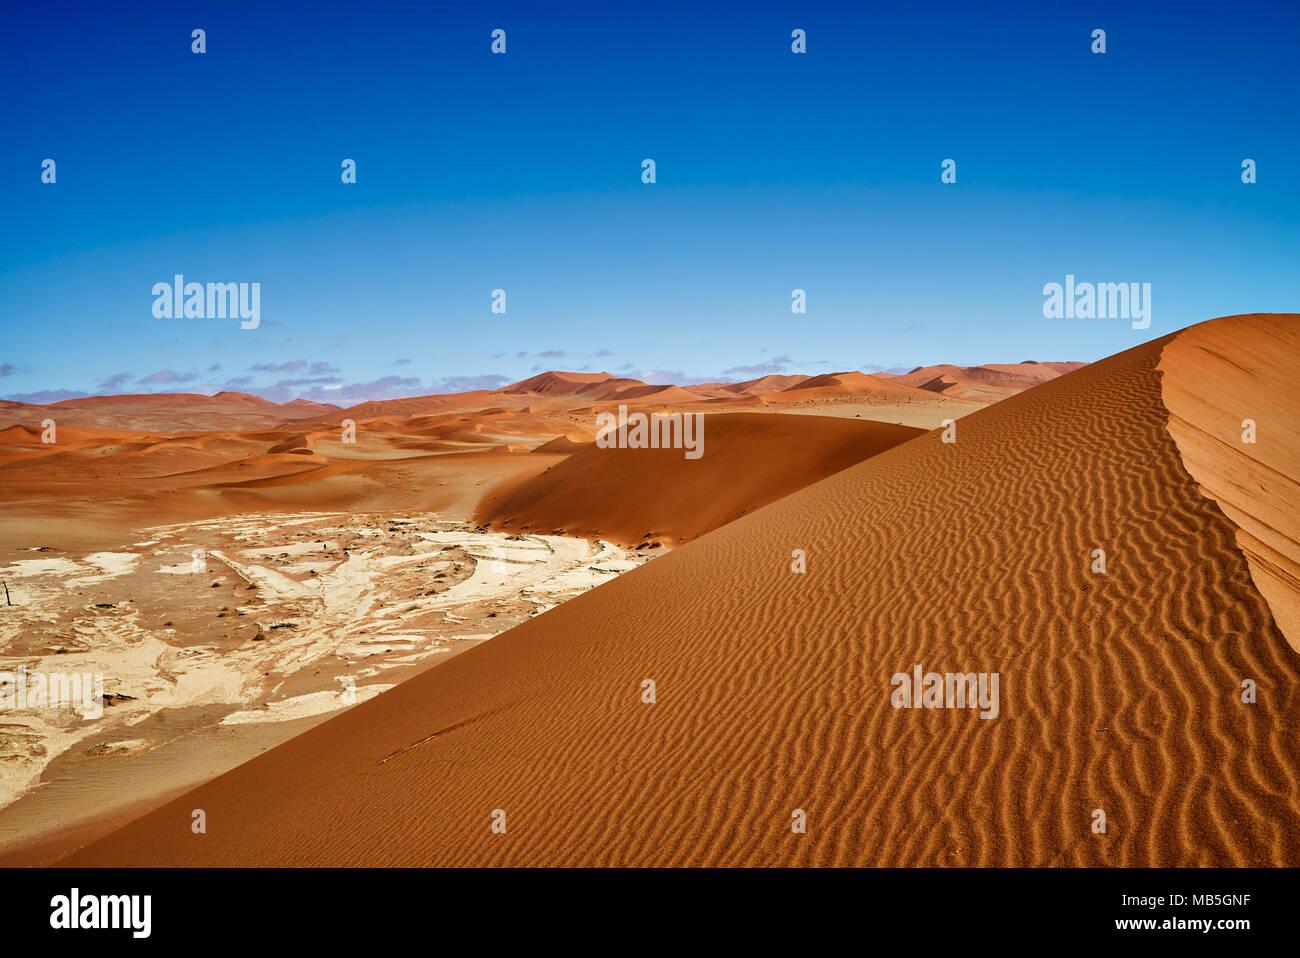 desert landscape of Namib with Dead Vlei, Namib-Naukluft National Park, Namibia, Africa - Stock Image